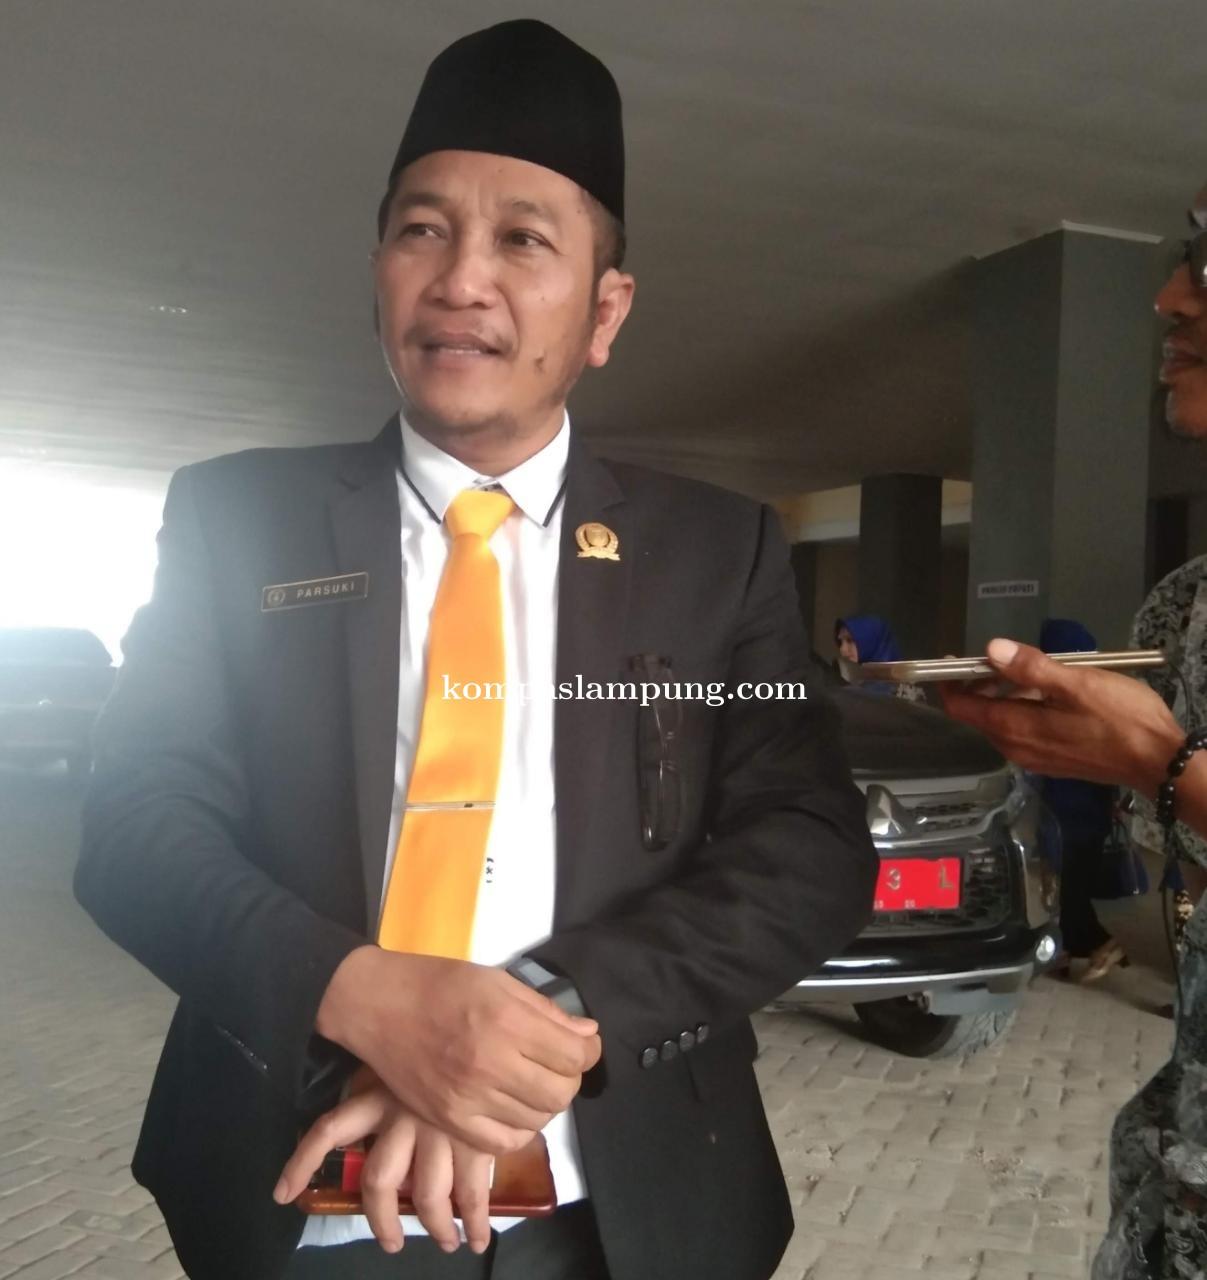 DPRD Kab Mesuji Akan Segera Menindaklanjuti Dugaan Pengecoran BBM Jenis Premium